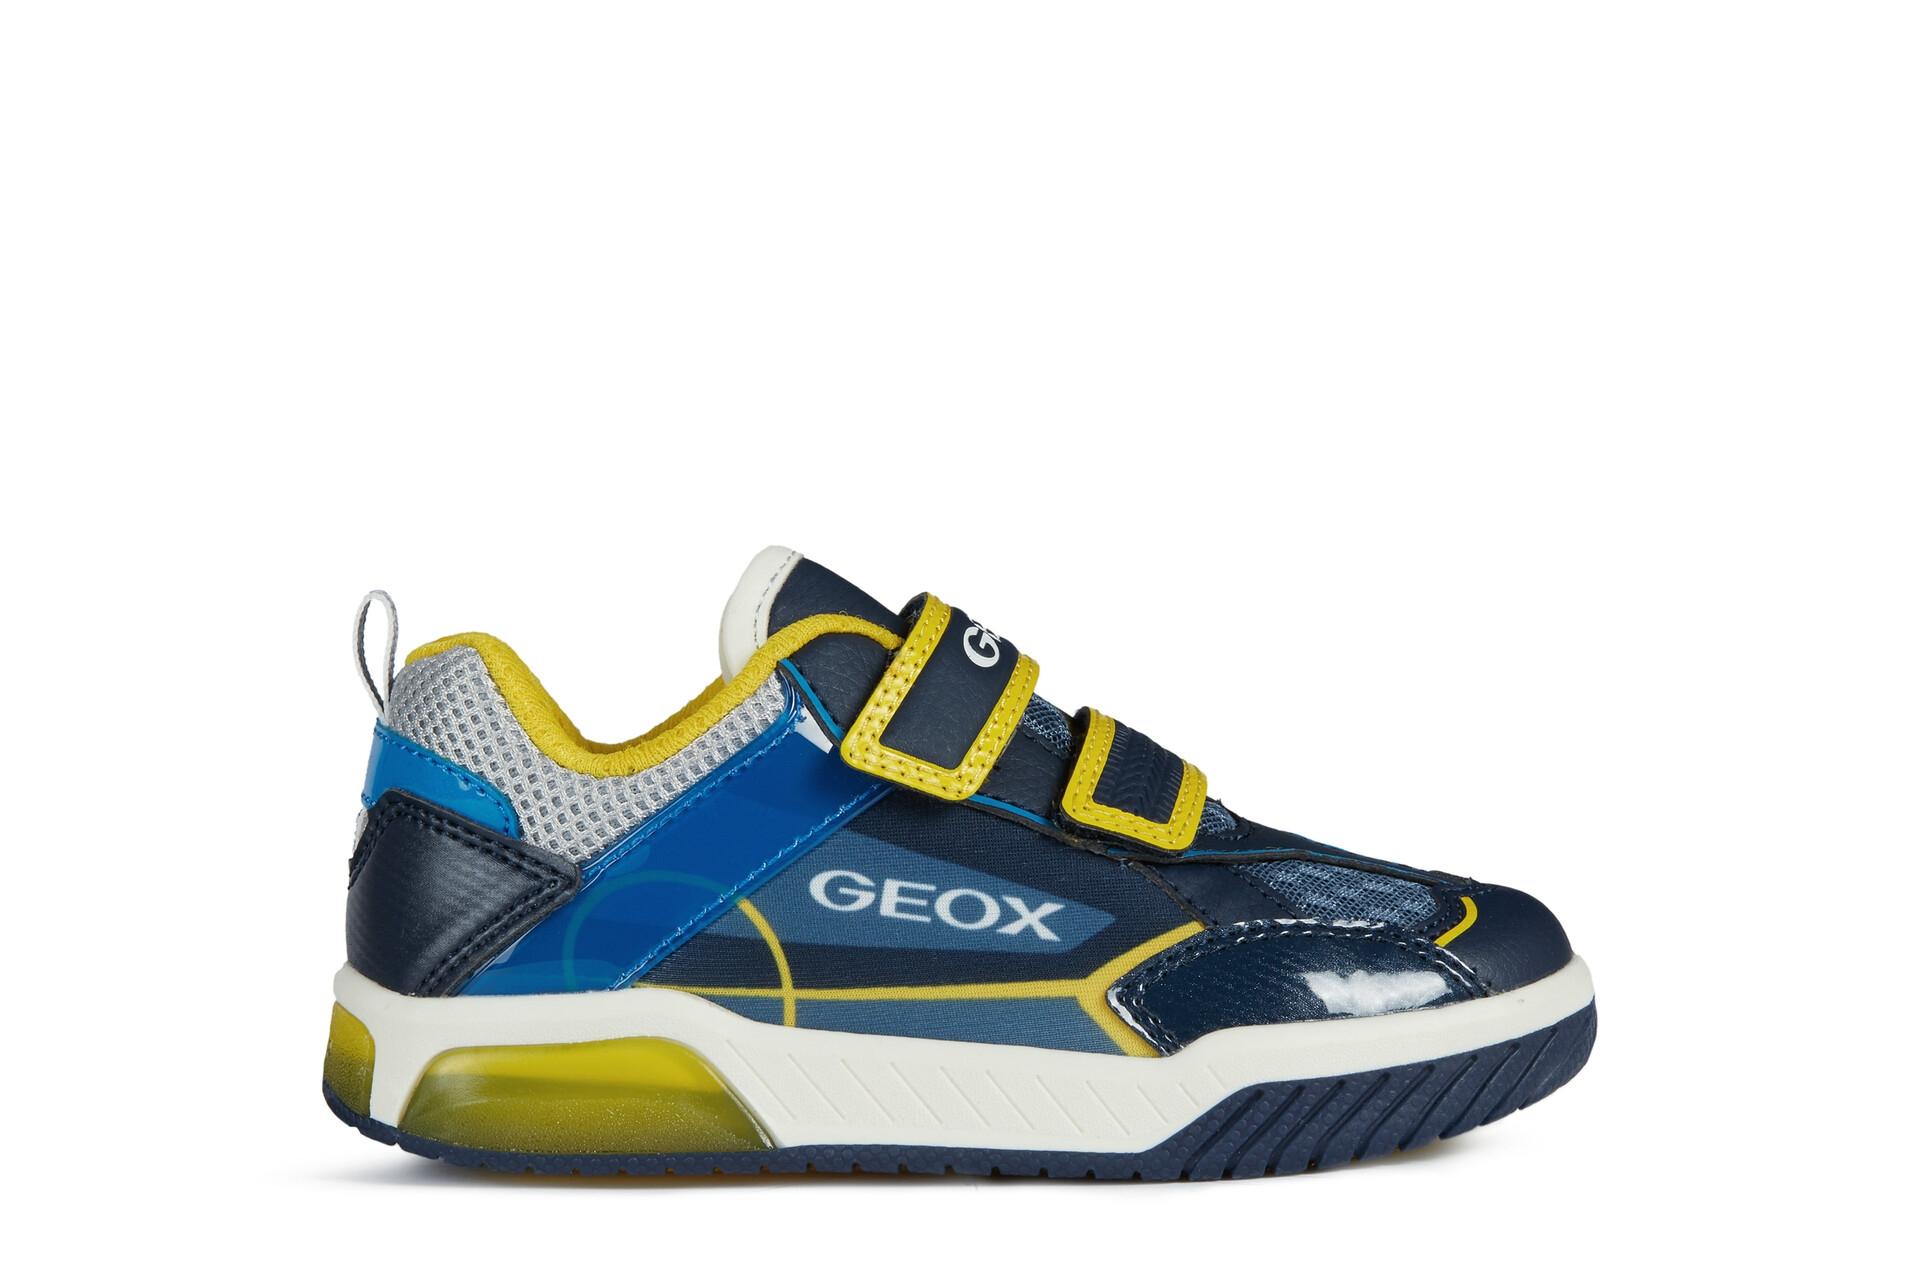 Geox Boys Trainer   INEK lights   Navy/Yellow